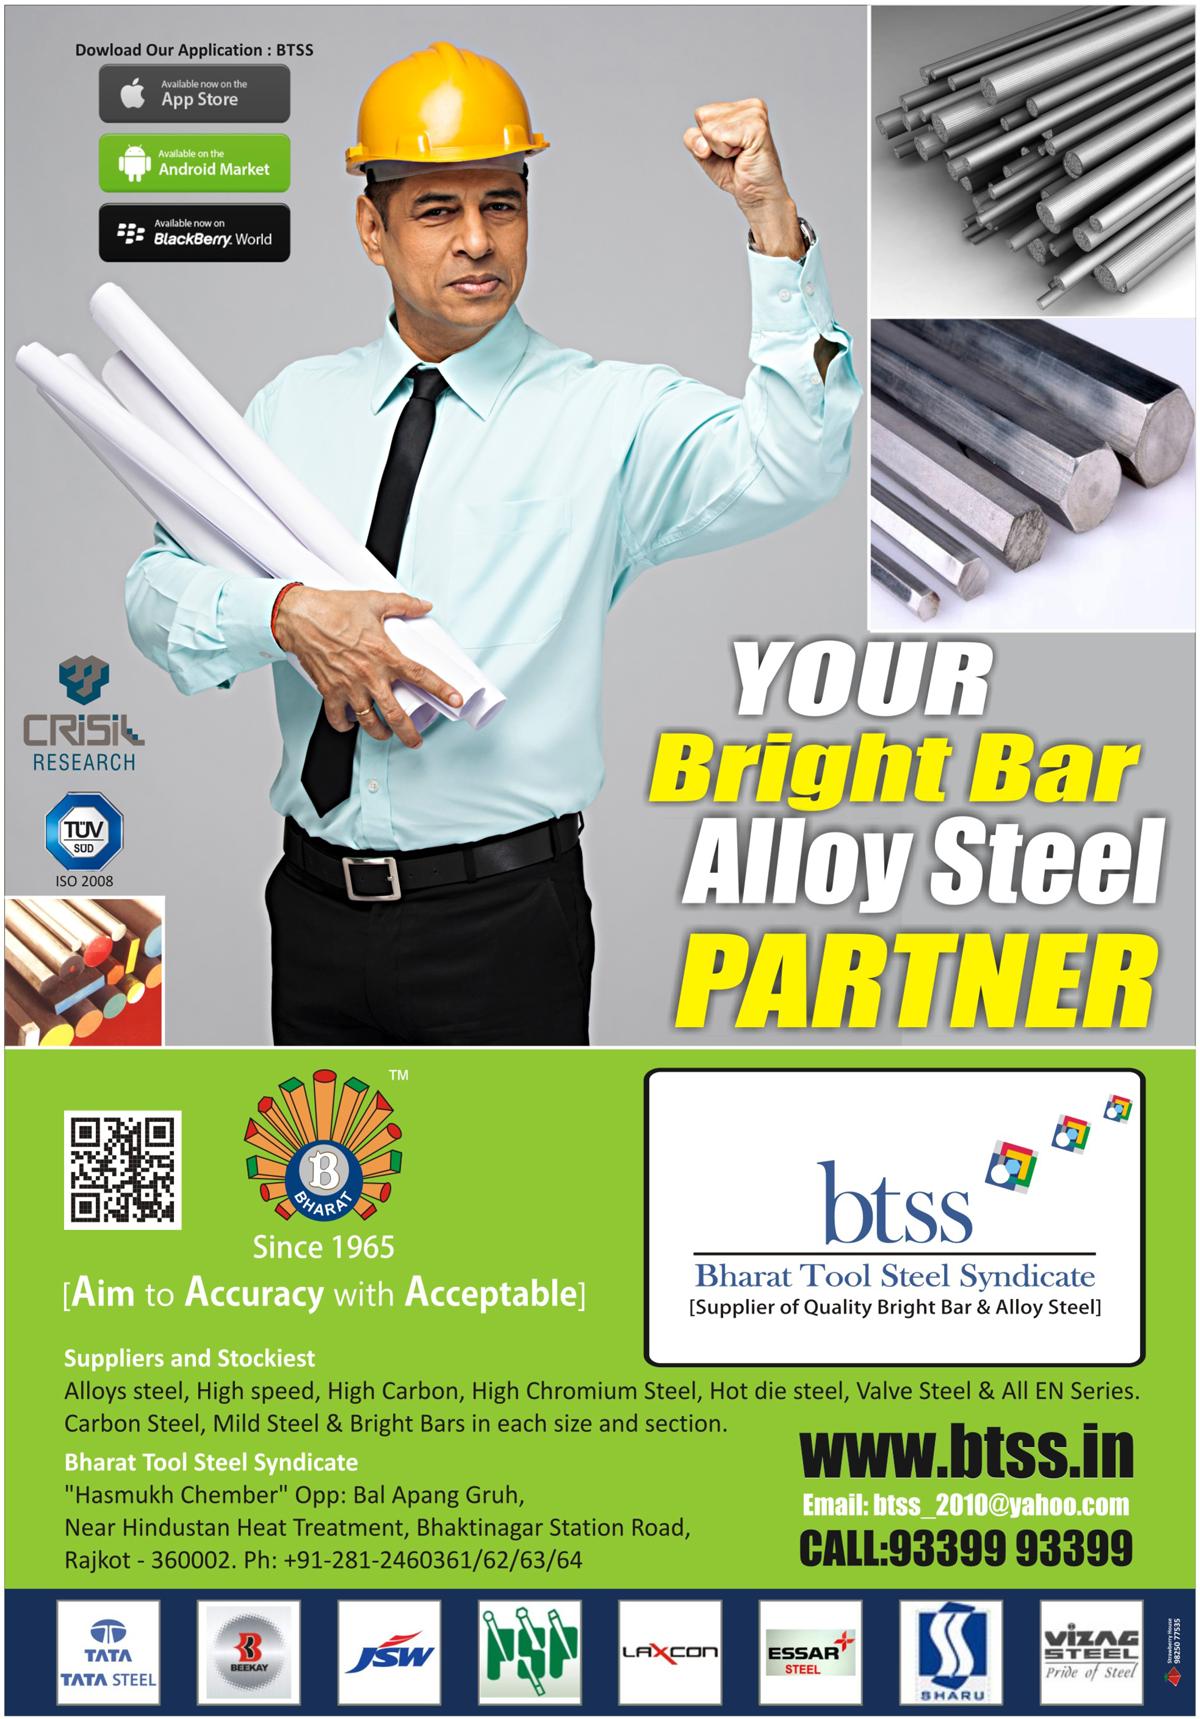 Steel Bright Bars, Alloy Steel Bars, Hot Die Steel Bars, Valve Steel Bars, Carbon Steel Bars, Mild Steel Bars